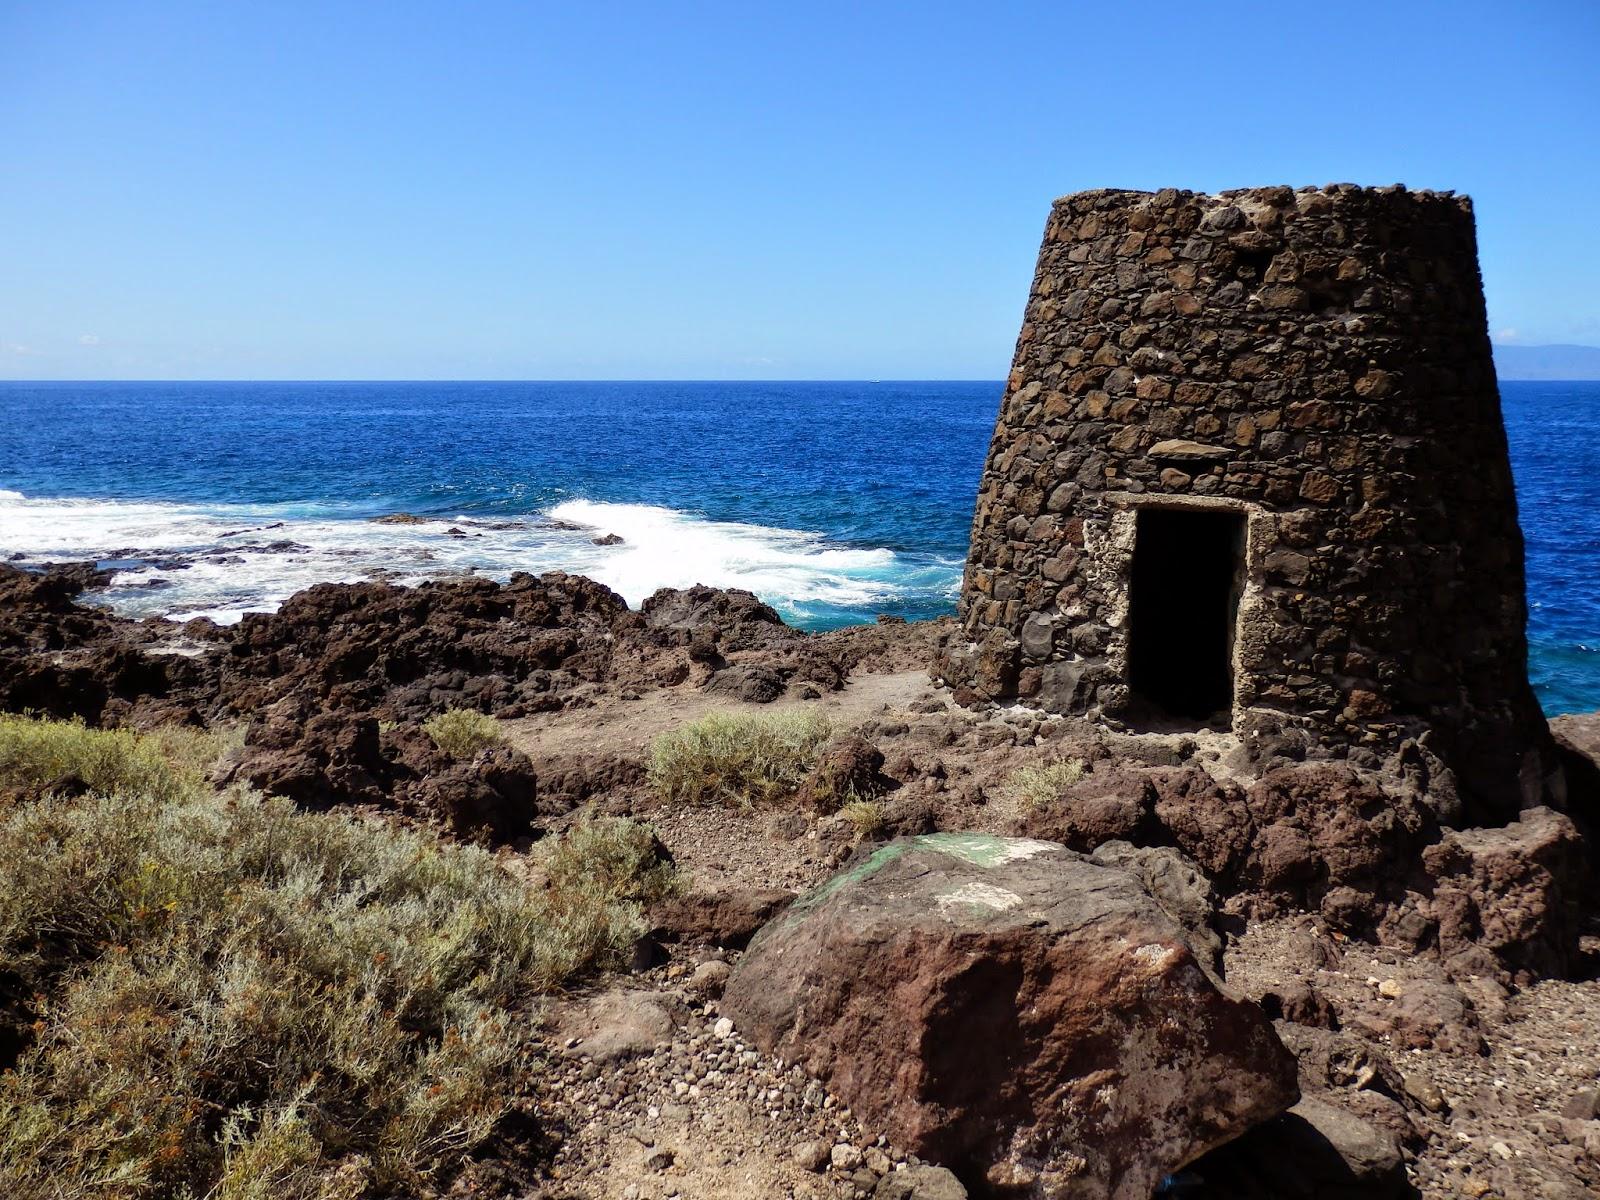 Kiln in Tenerife Canary Islands